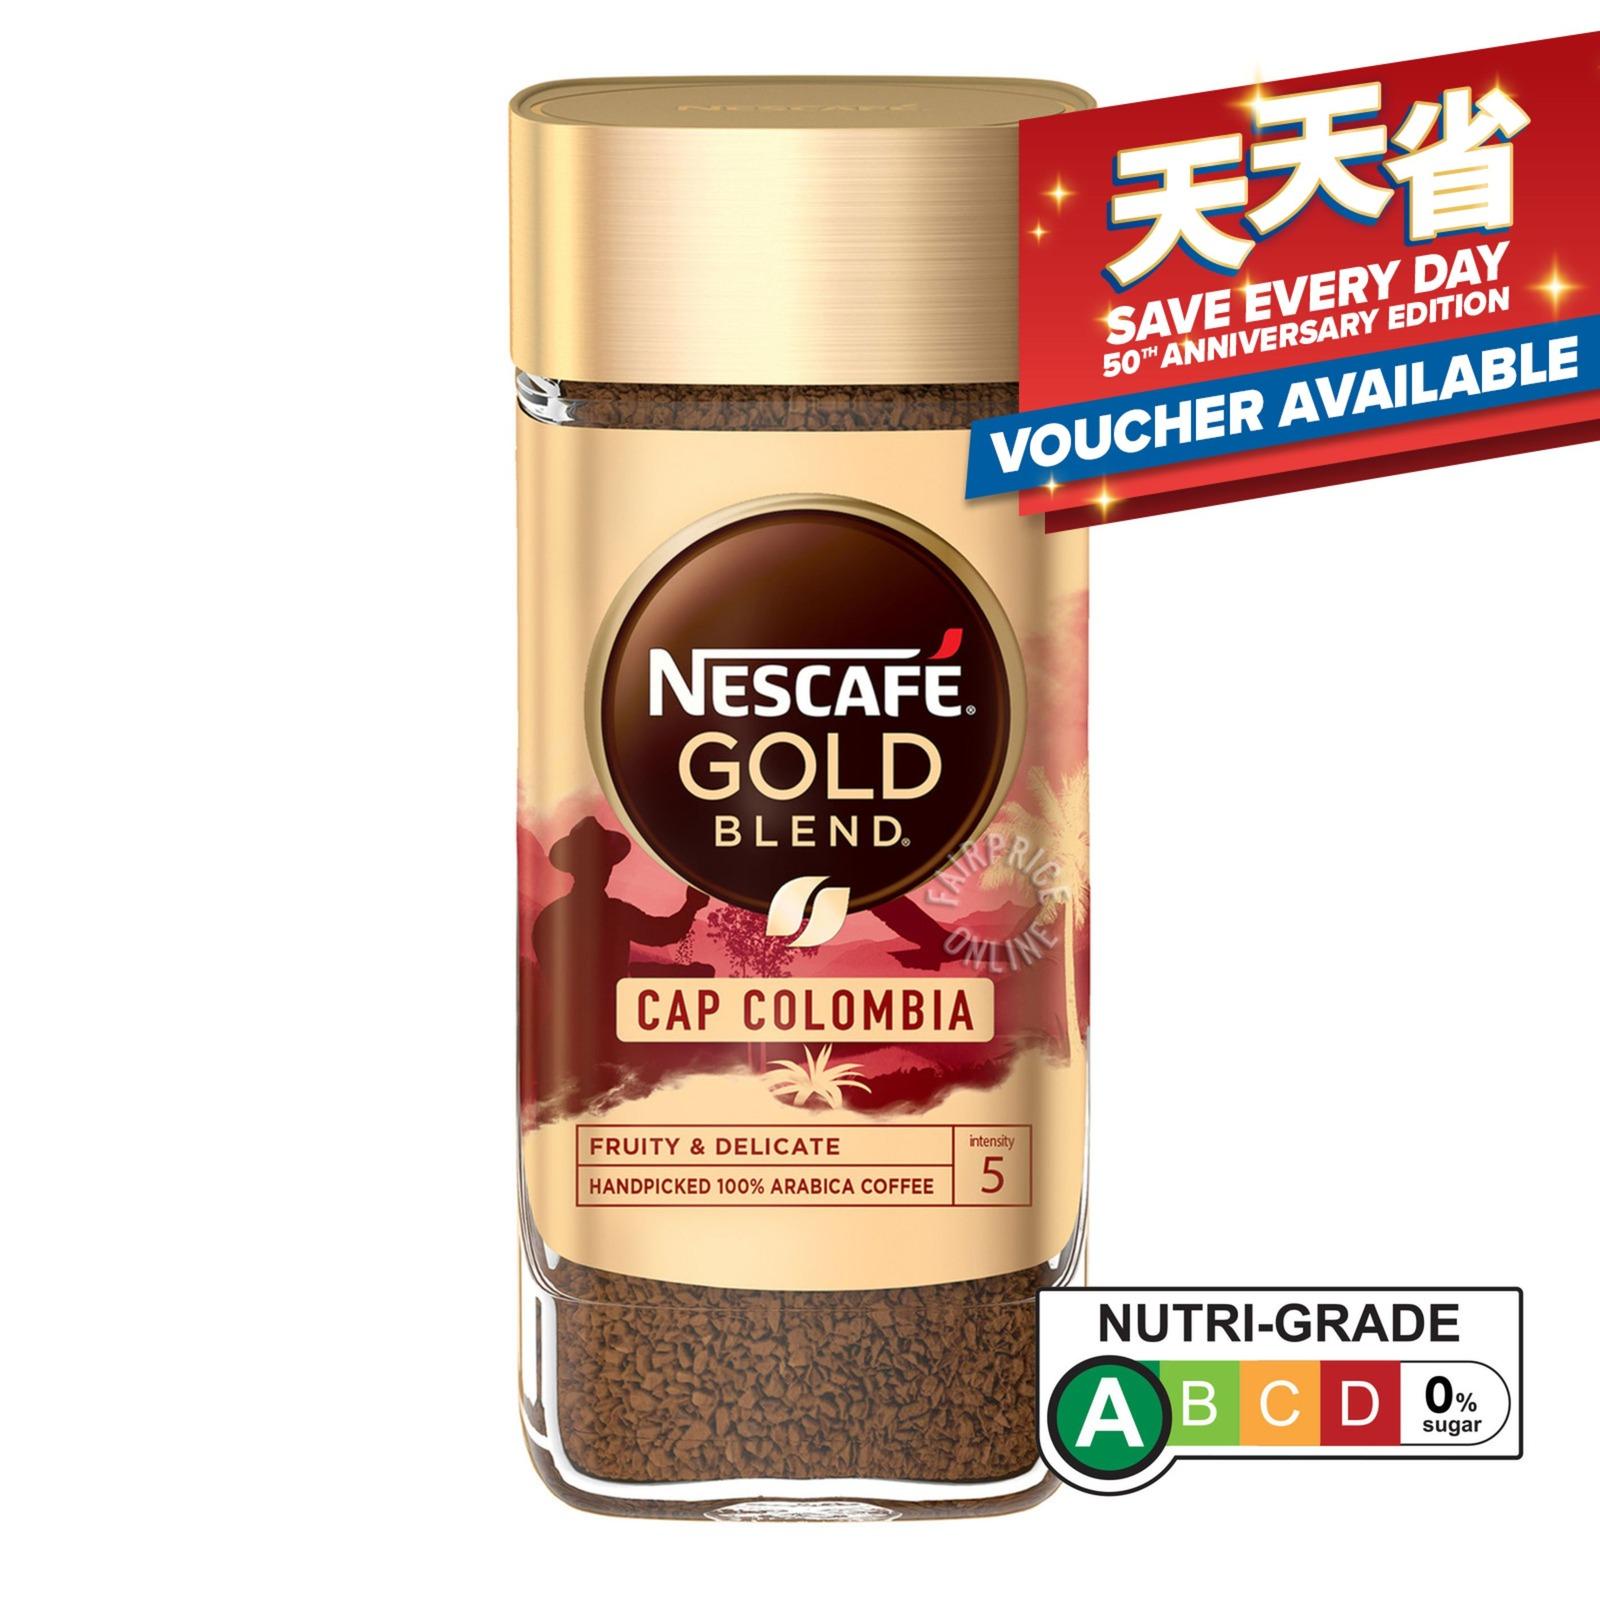 Nescafe Gold Origins Freeze Dried Arabica Coffee - Cap Colombia